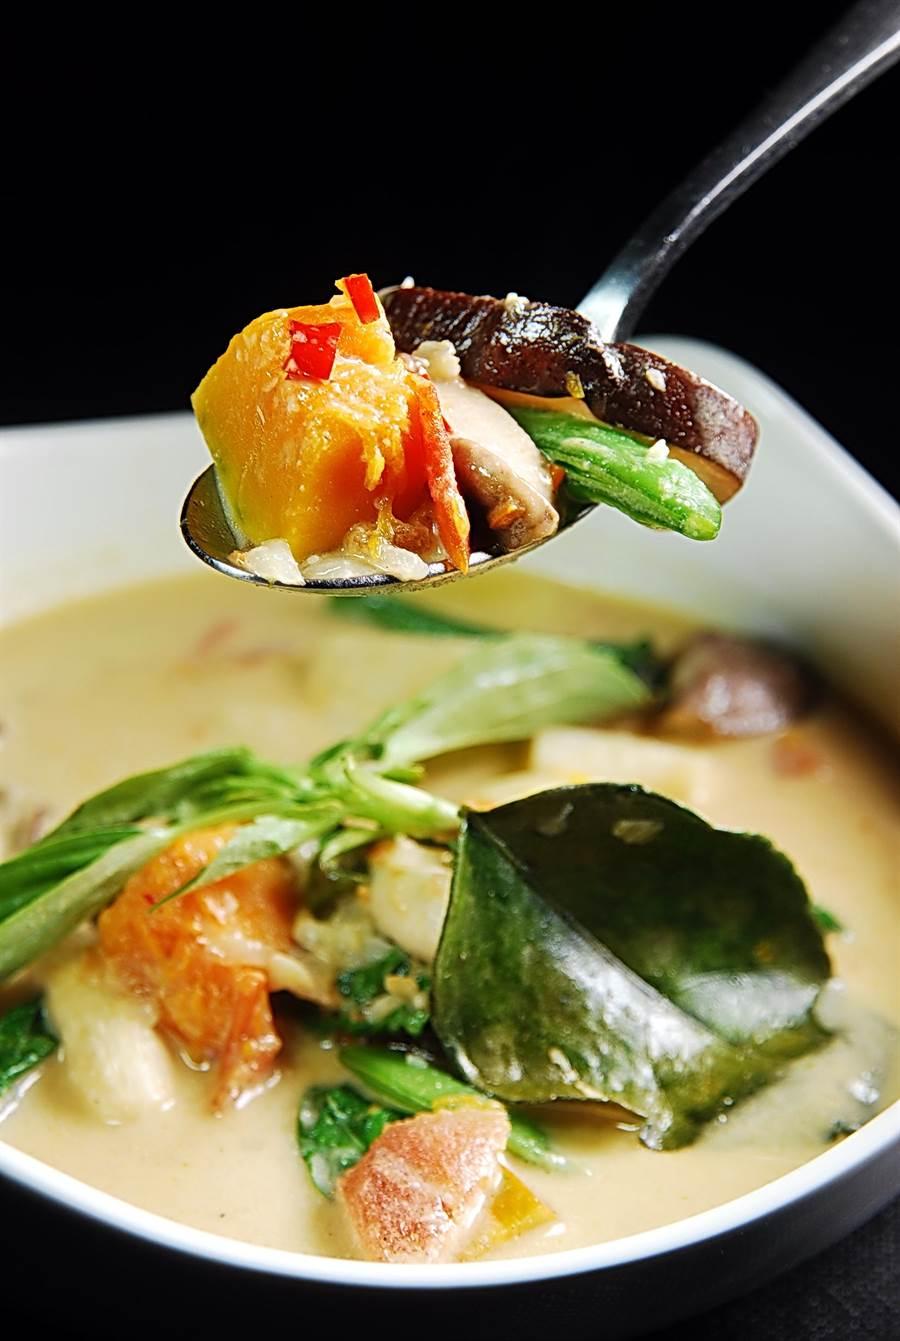 〈Green Room〉的〈綠咖哩〉,內有香菇、腰豆、豌豆、南瓜、胡蘿蔔與馬鈴薯等食材,咖啡醬汁淋在飯上亦非常開胃下飯。(圖/姚舜攝)